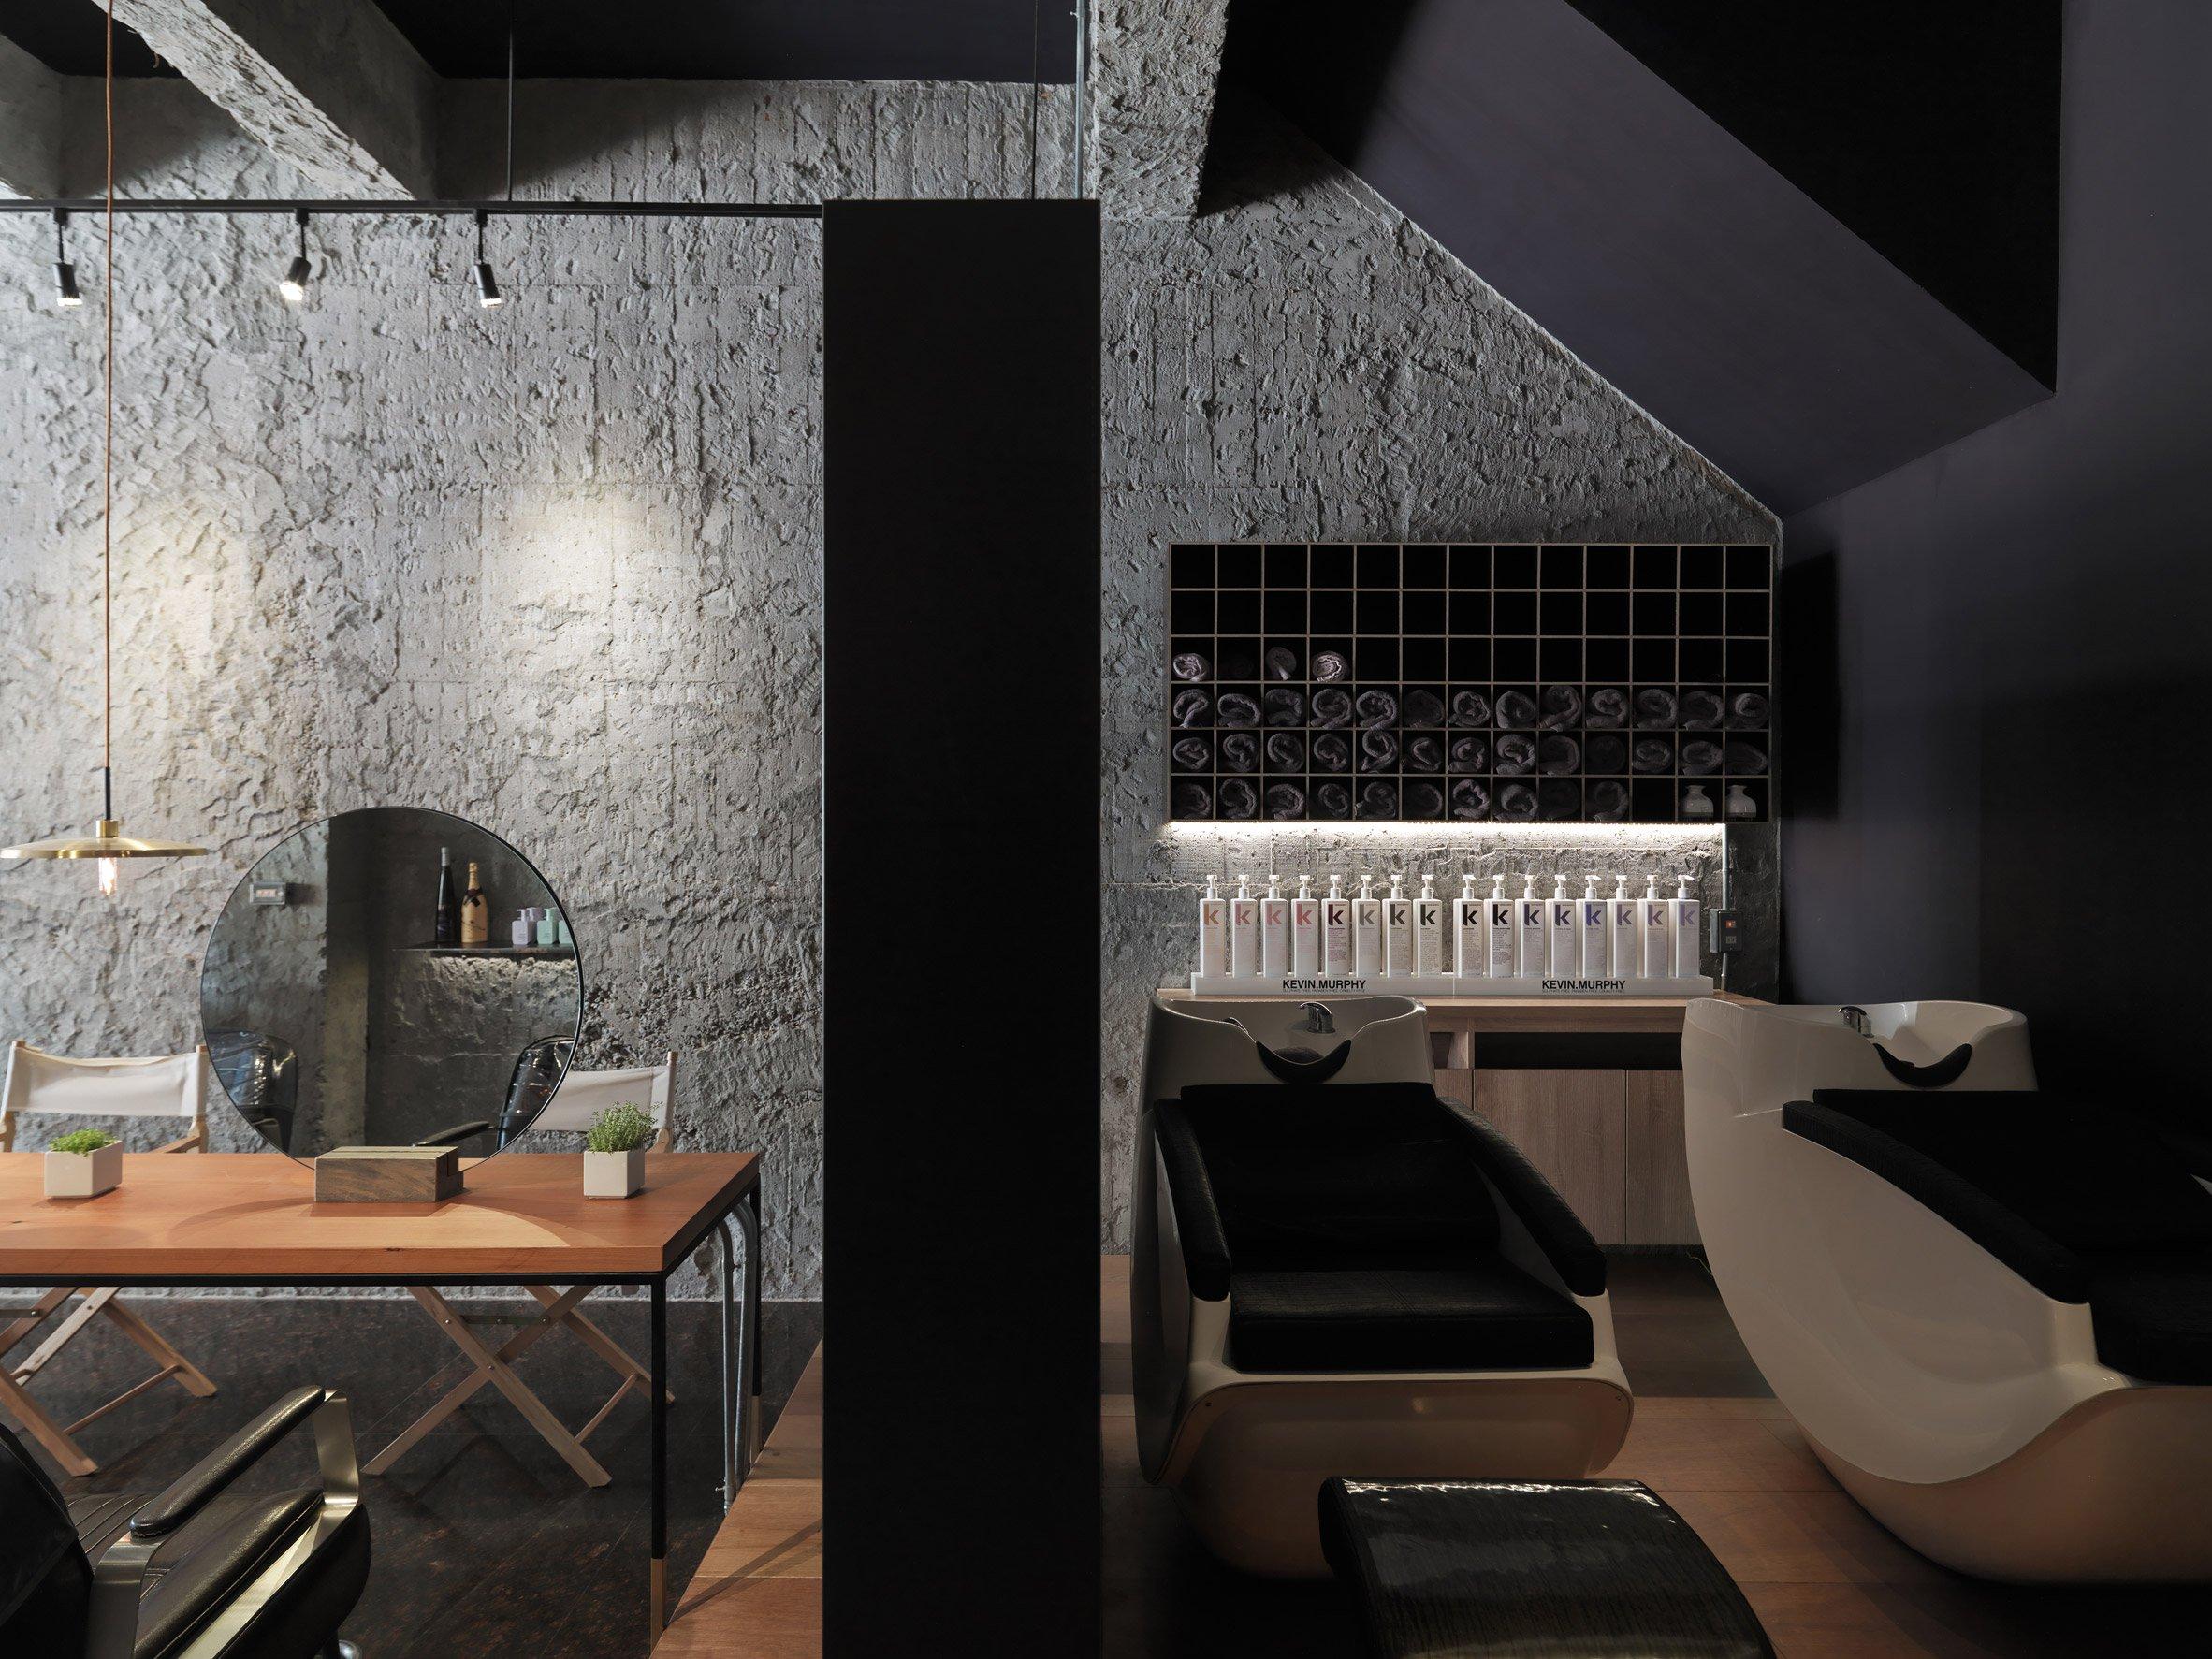 luna-salon-soar-design-interiors-changhua-taiwan_dezeen_2364_col_0